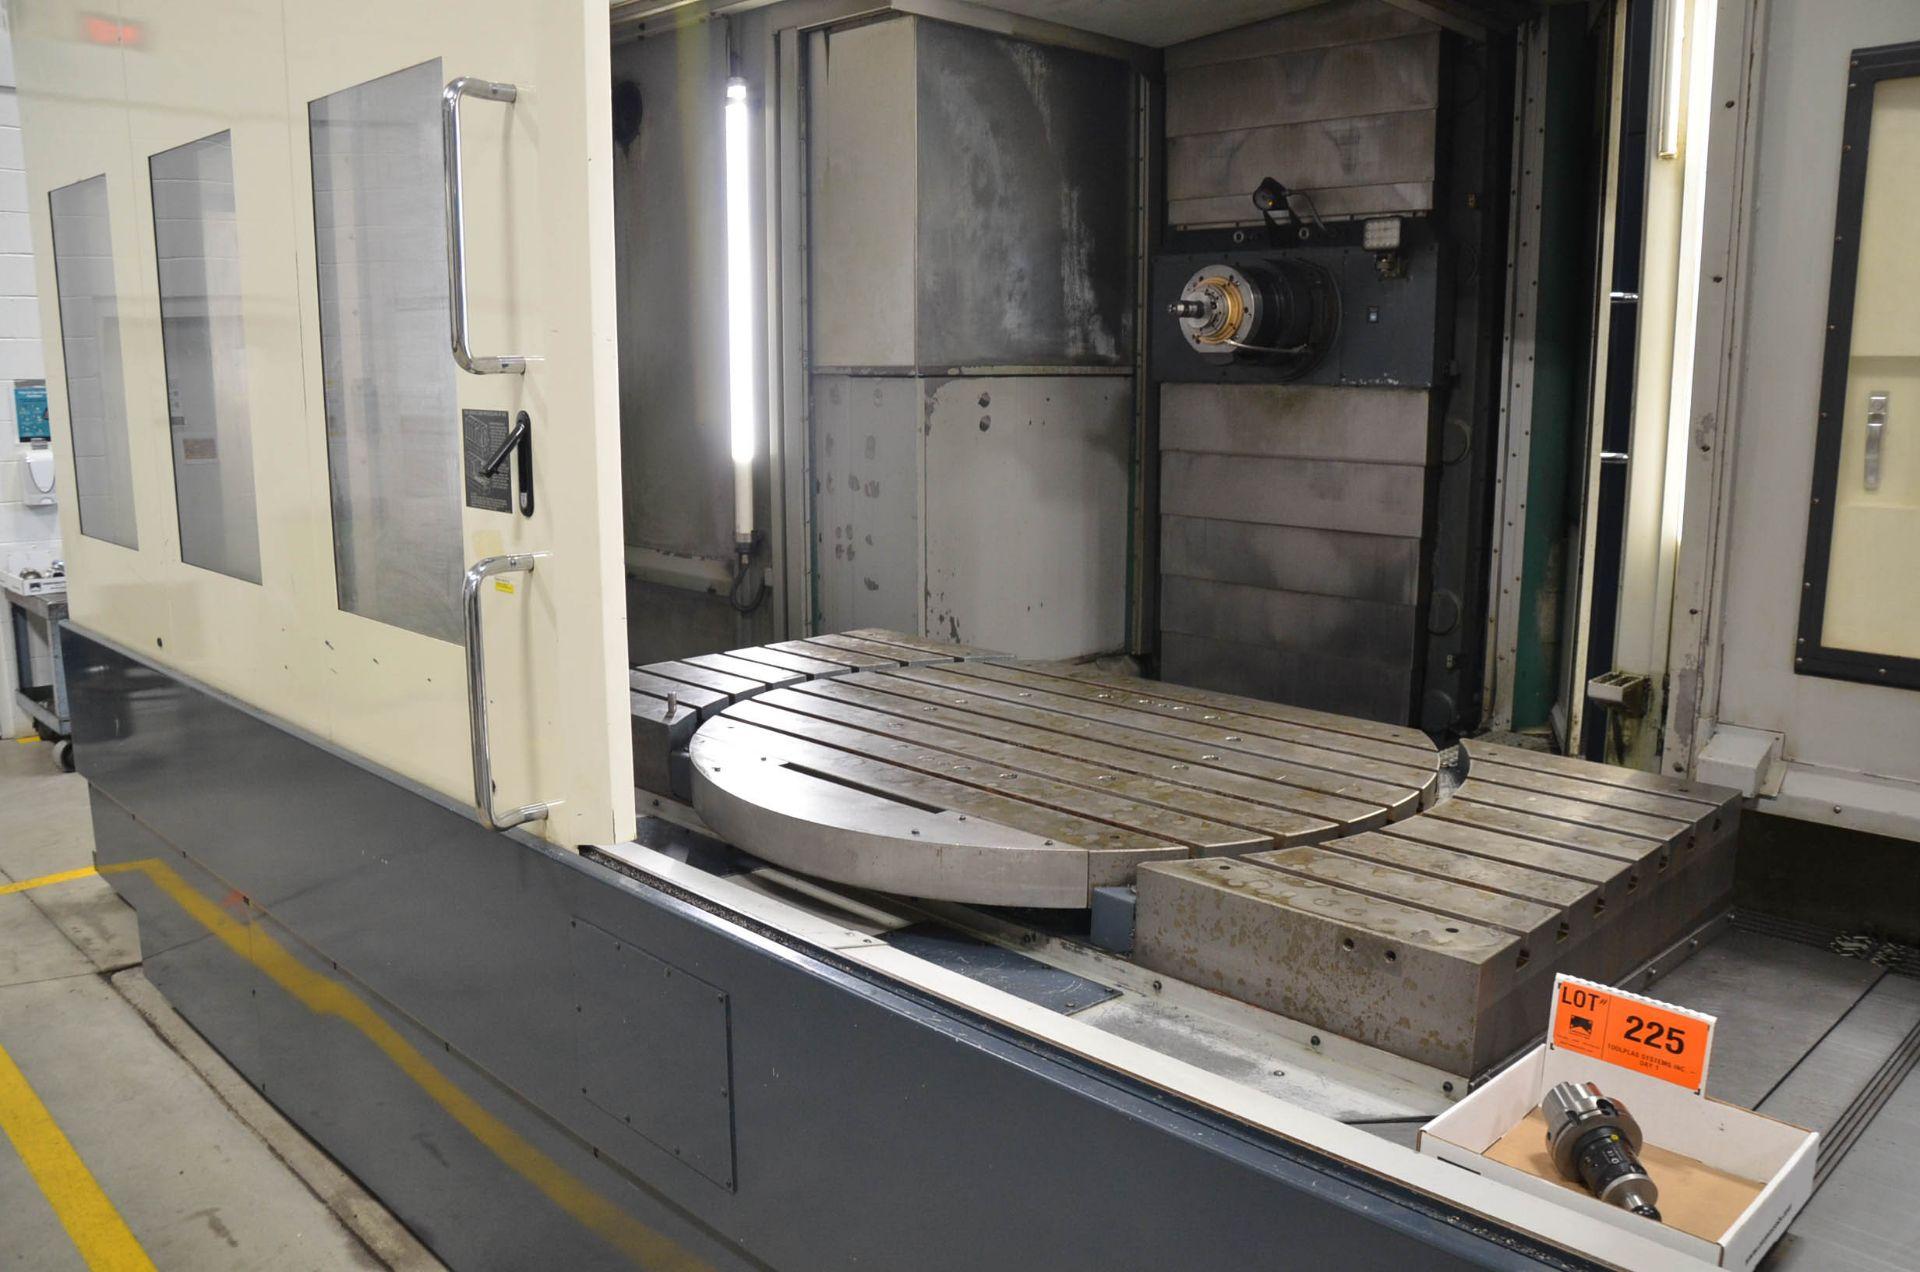 MAKINO (2008) MCC2013 4-AXIS HORIZONTAL MACHINING CENTER WITH MAKINO PROFESSIONAL 5 CNC CONTROL, - Image 11 of 12